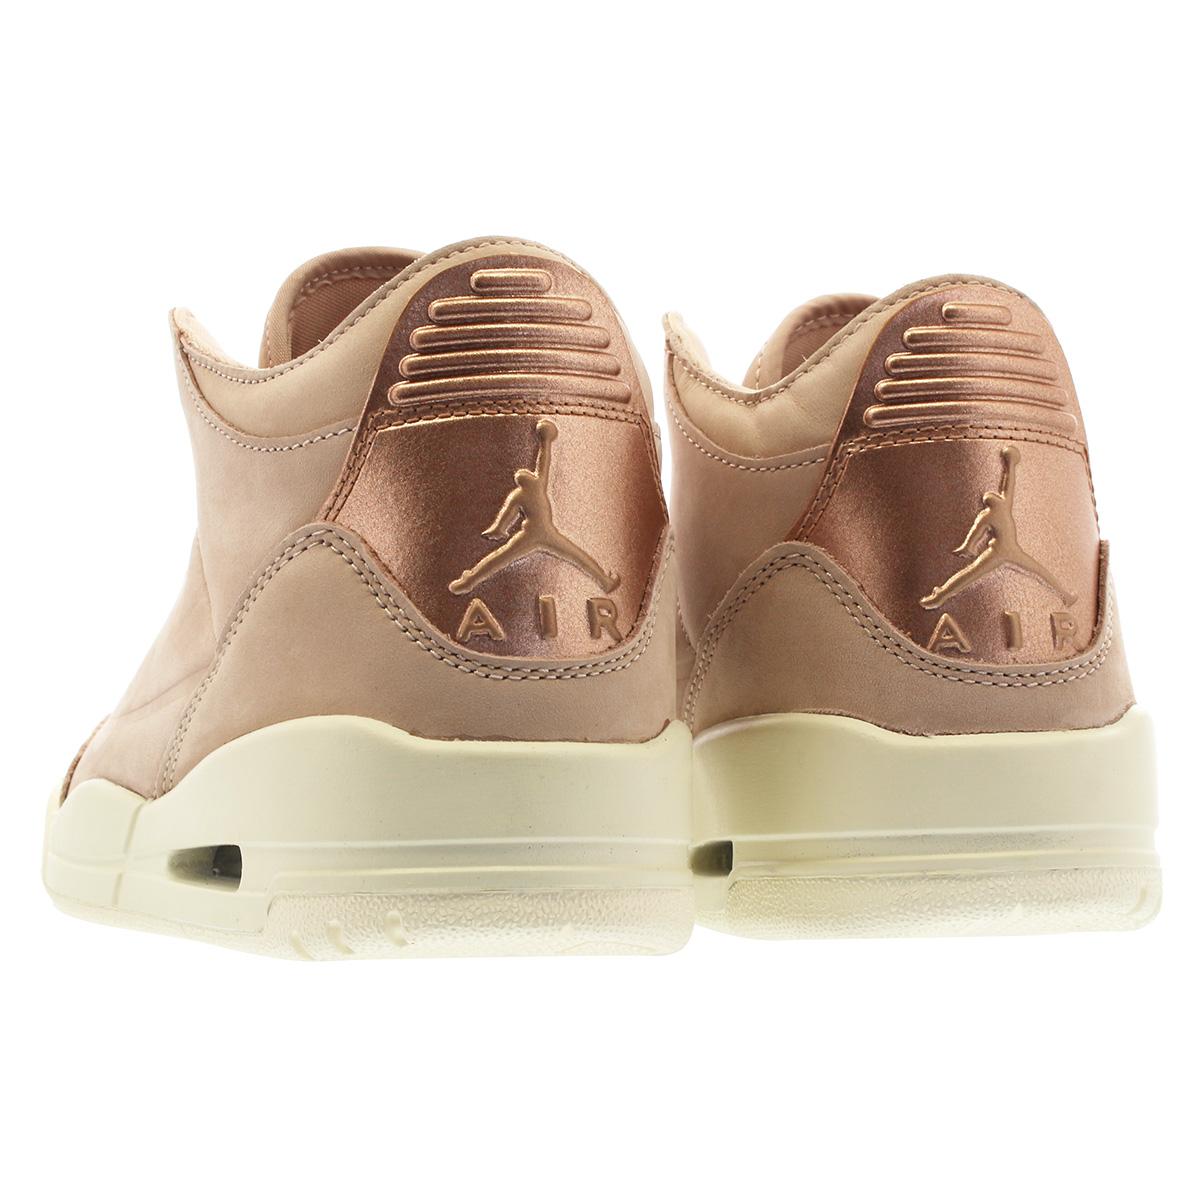 06d289f2f7a ... NIKE WMNS AIR JORDAN 3 RETRO SE Nike women Air Jordan 3 nostalgic PARTICLE  BEIGE/ ...